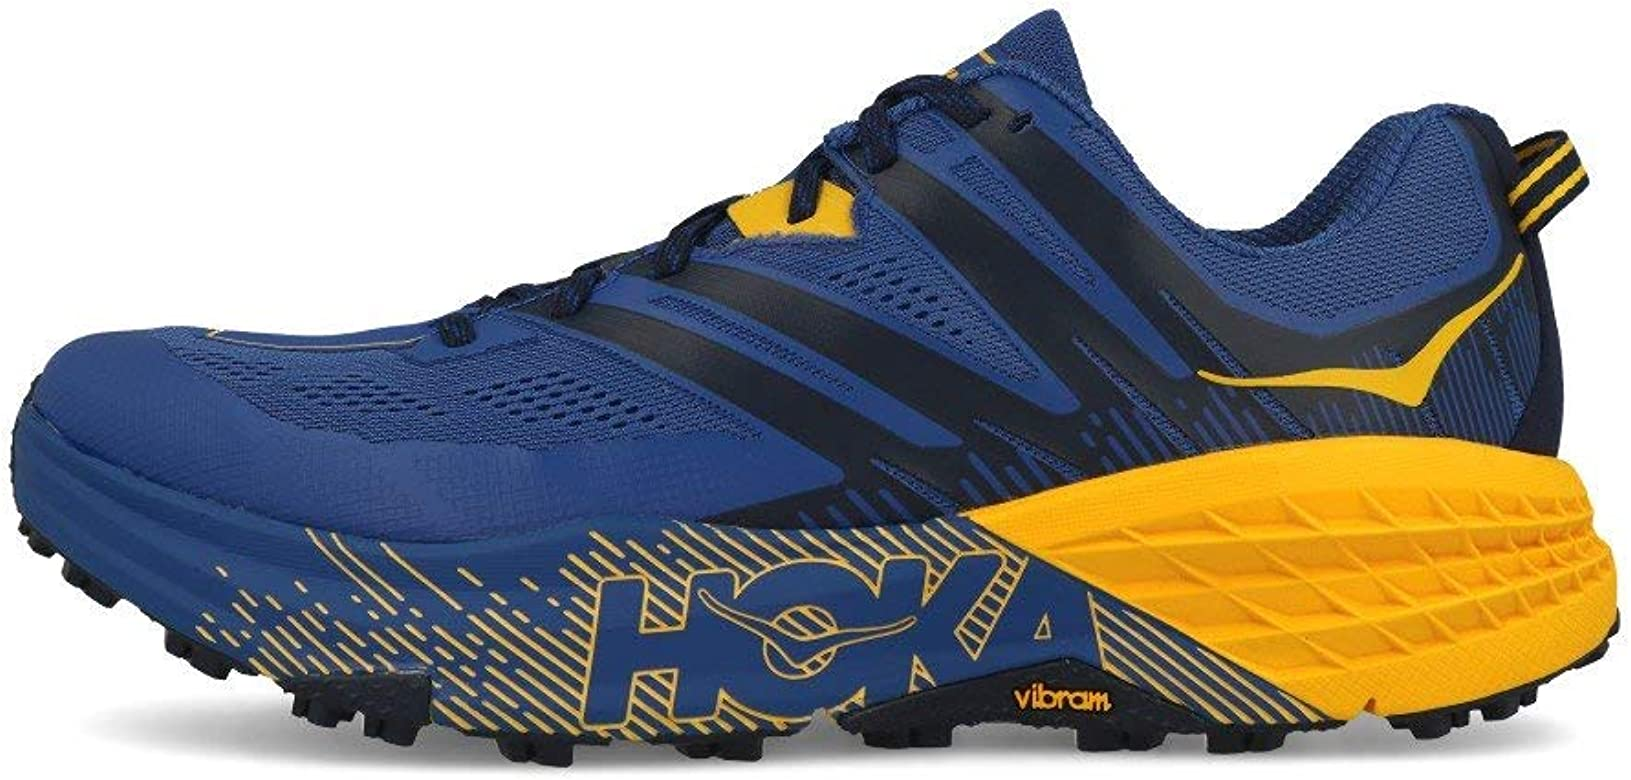 HOKA ONE One Speedgoat 3 Deportivas Hombres Azul/Oro - 41 1/3 - Running/ Trail: Amazon.es: Zapatos y complementos